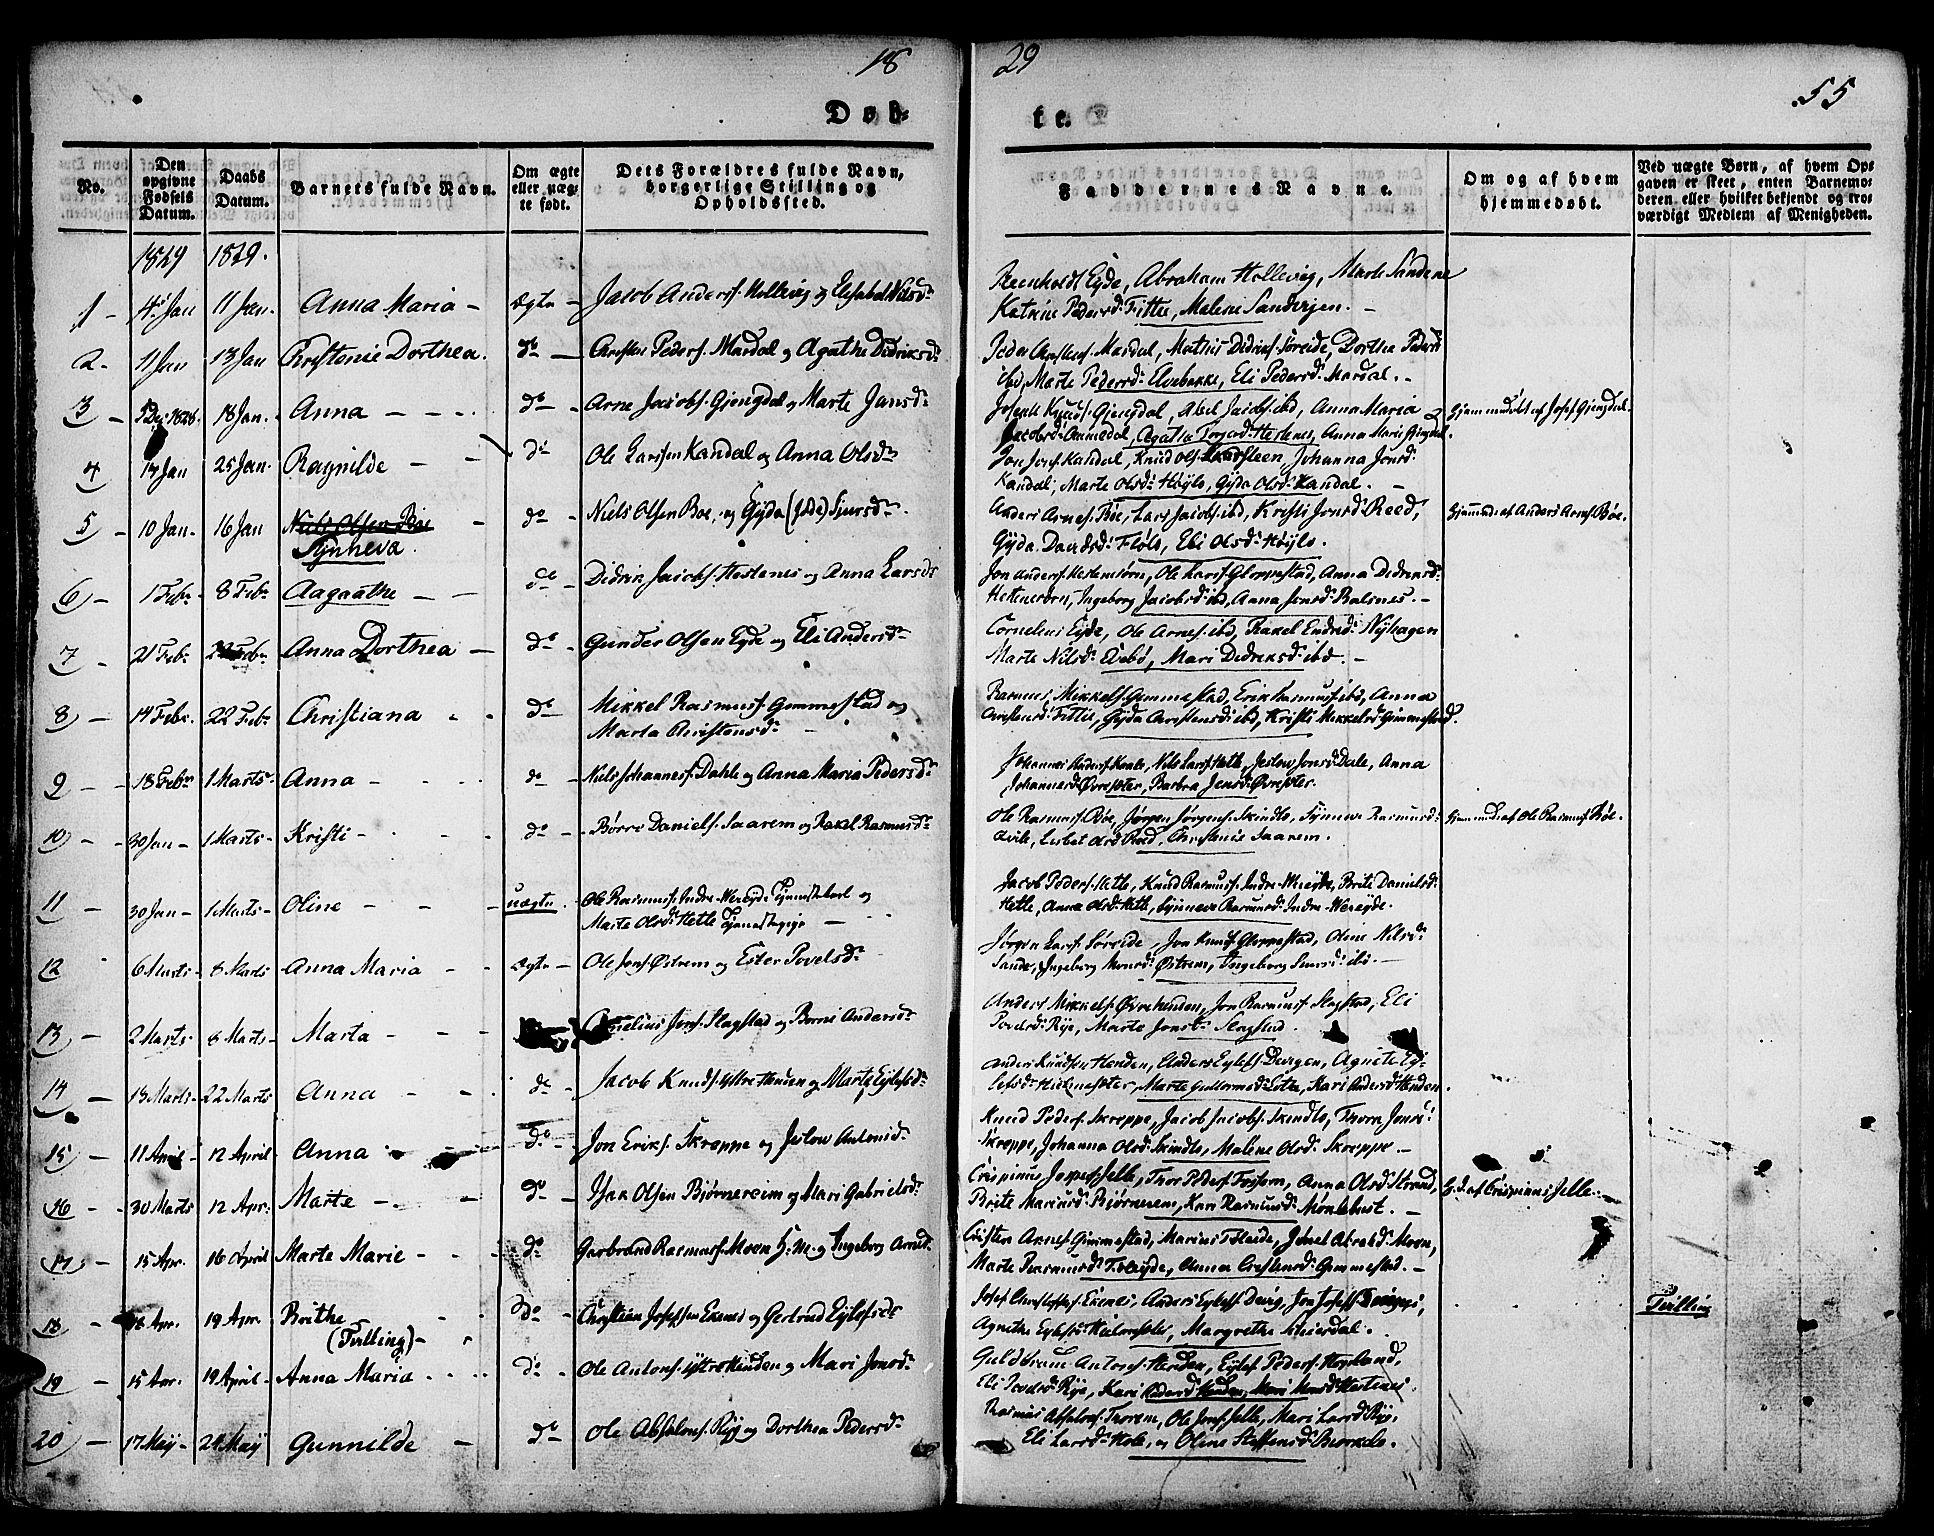 SAB, Gloppen Sokneprestembete, H/Haa/Haaa/L0007: Ministerialbok nr. A 7, 1827-1837, s. 55